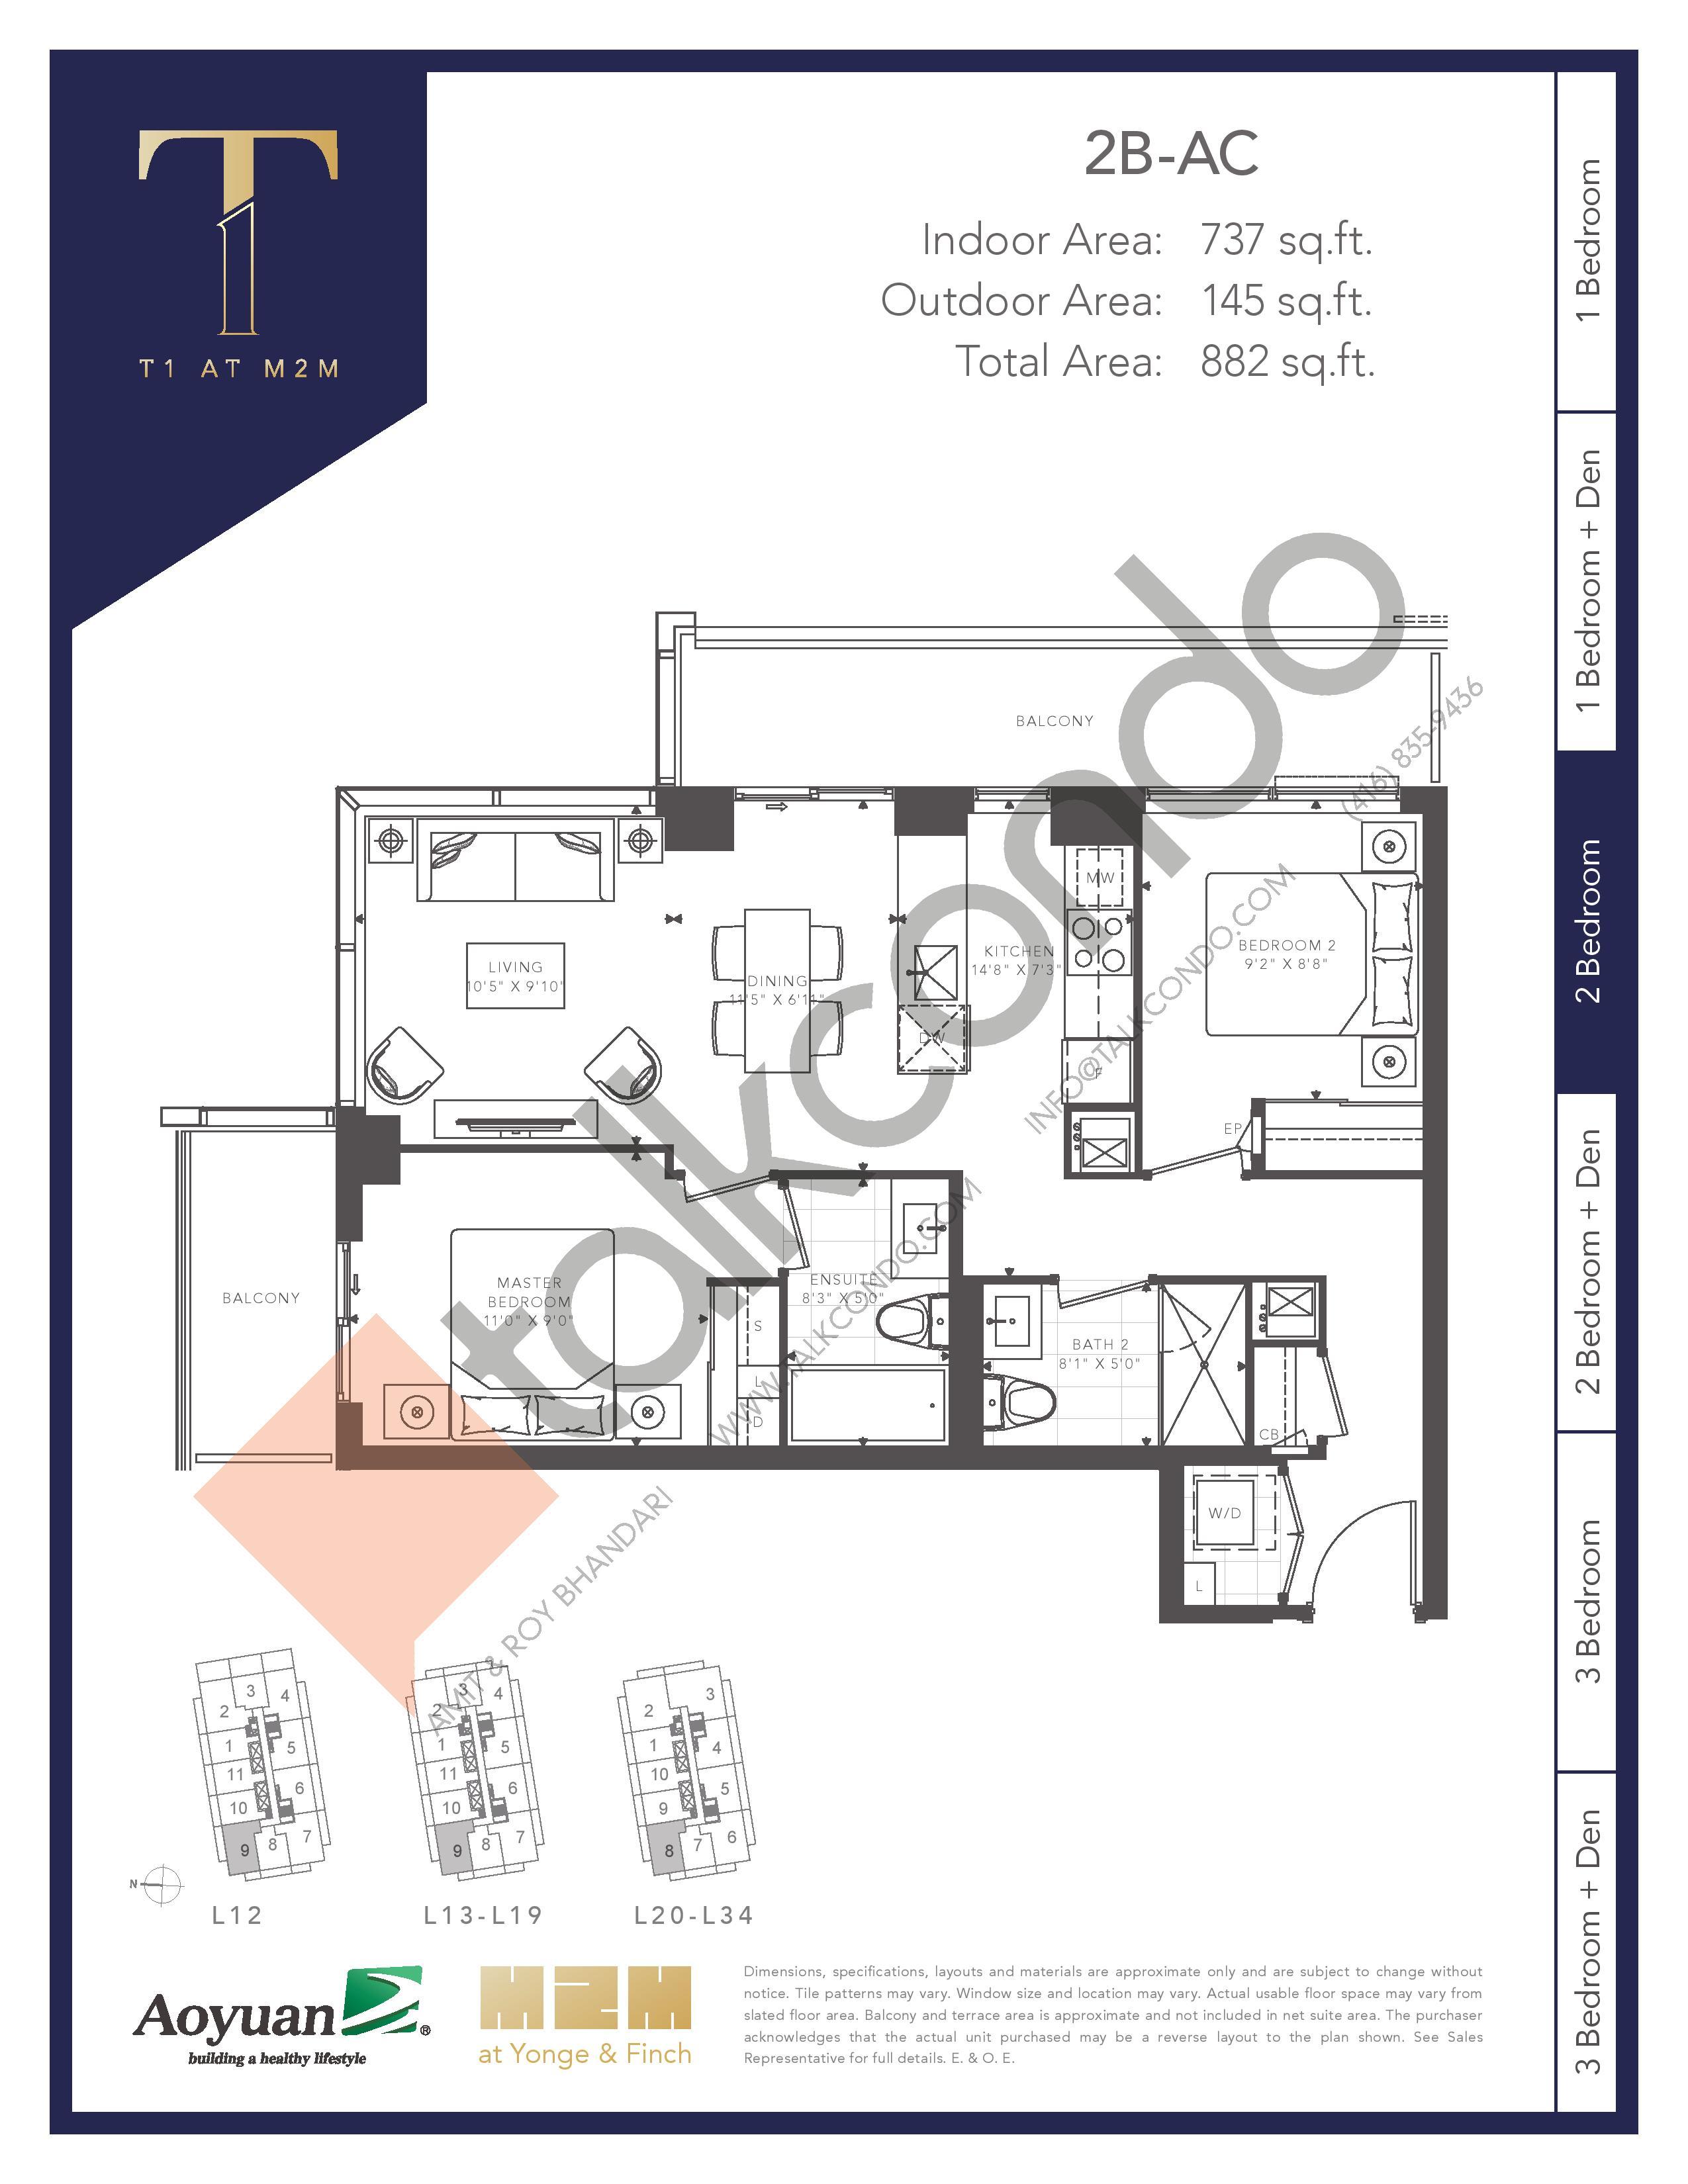 2B-AC (Tower) Floor Plan at T1 at M2M Condos - 737 sq.ft